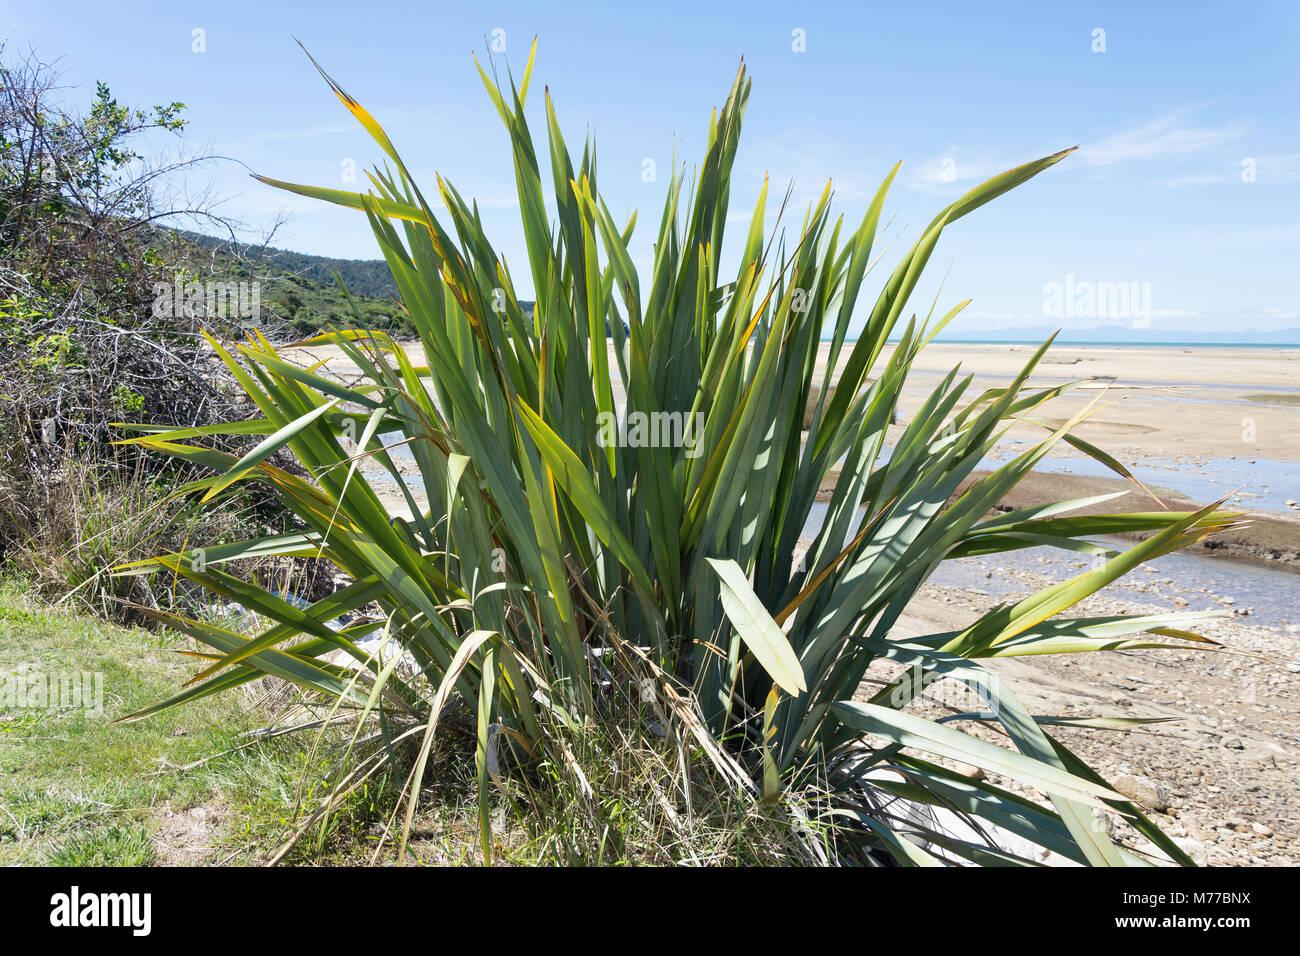 Heimat Neuseeland Flachspflanze (Formium), Sandy Bay, Abel Tasman National Park, Marahau, Tasman Bay, Tasman, Neuseeland Stockfoto